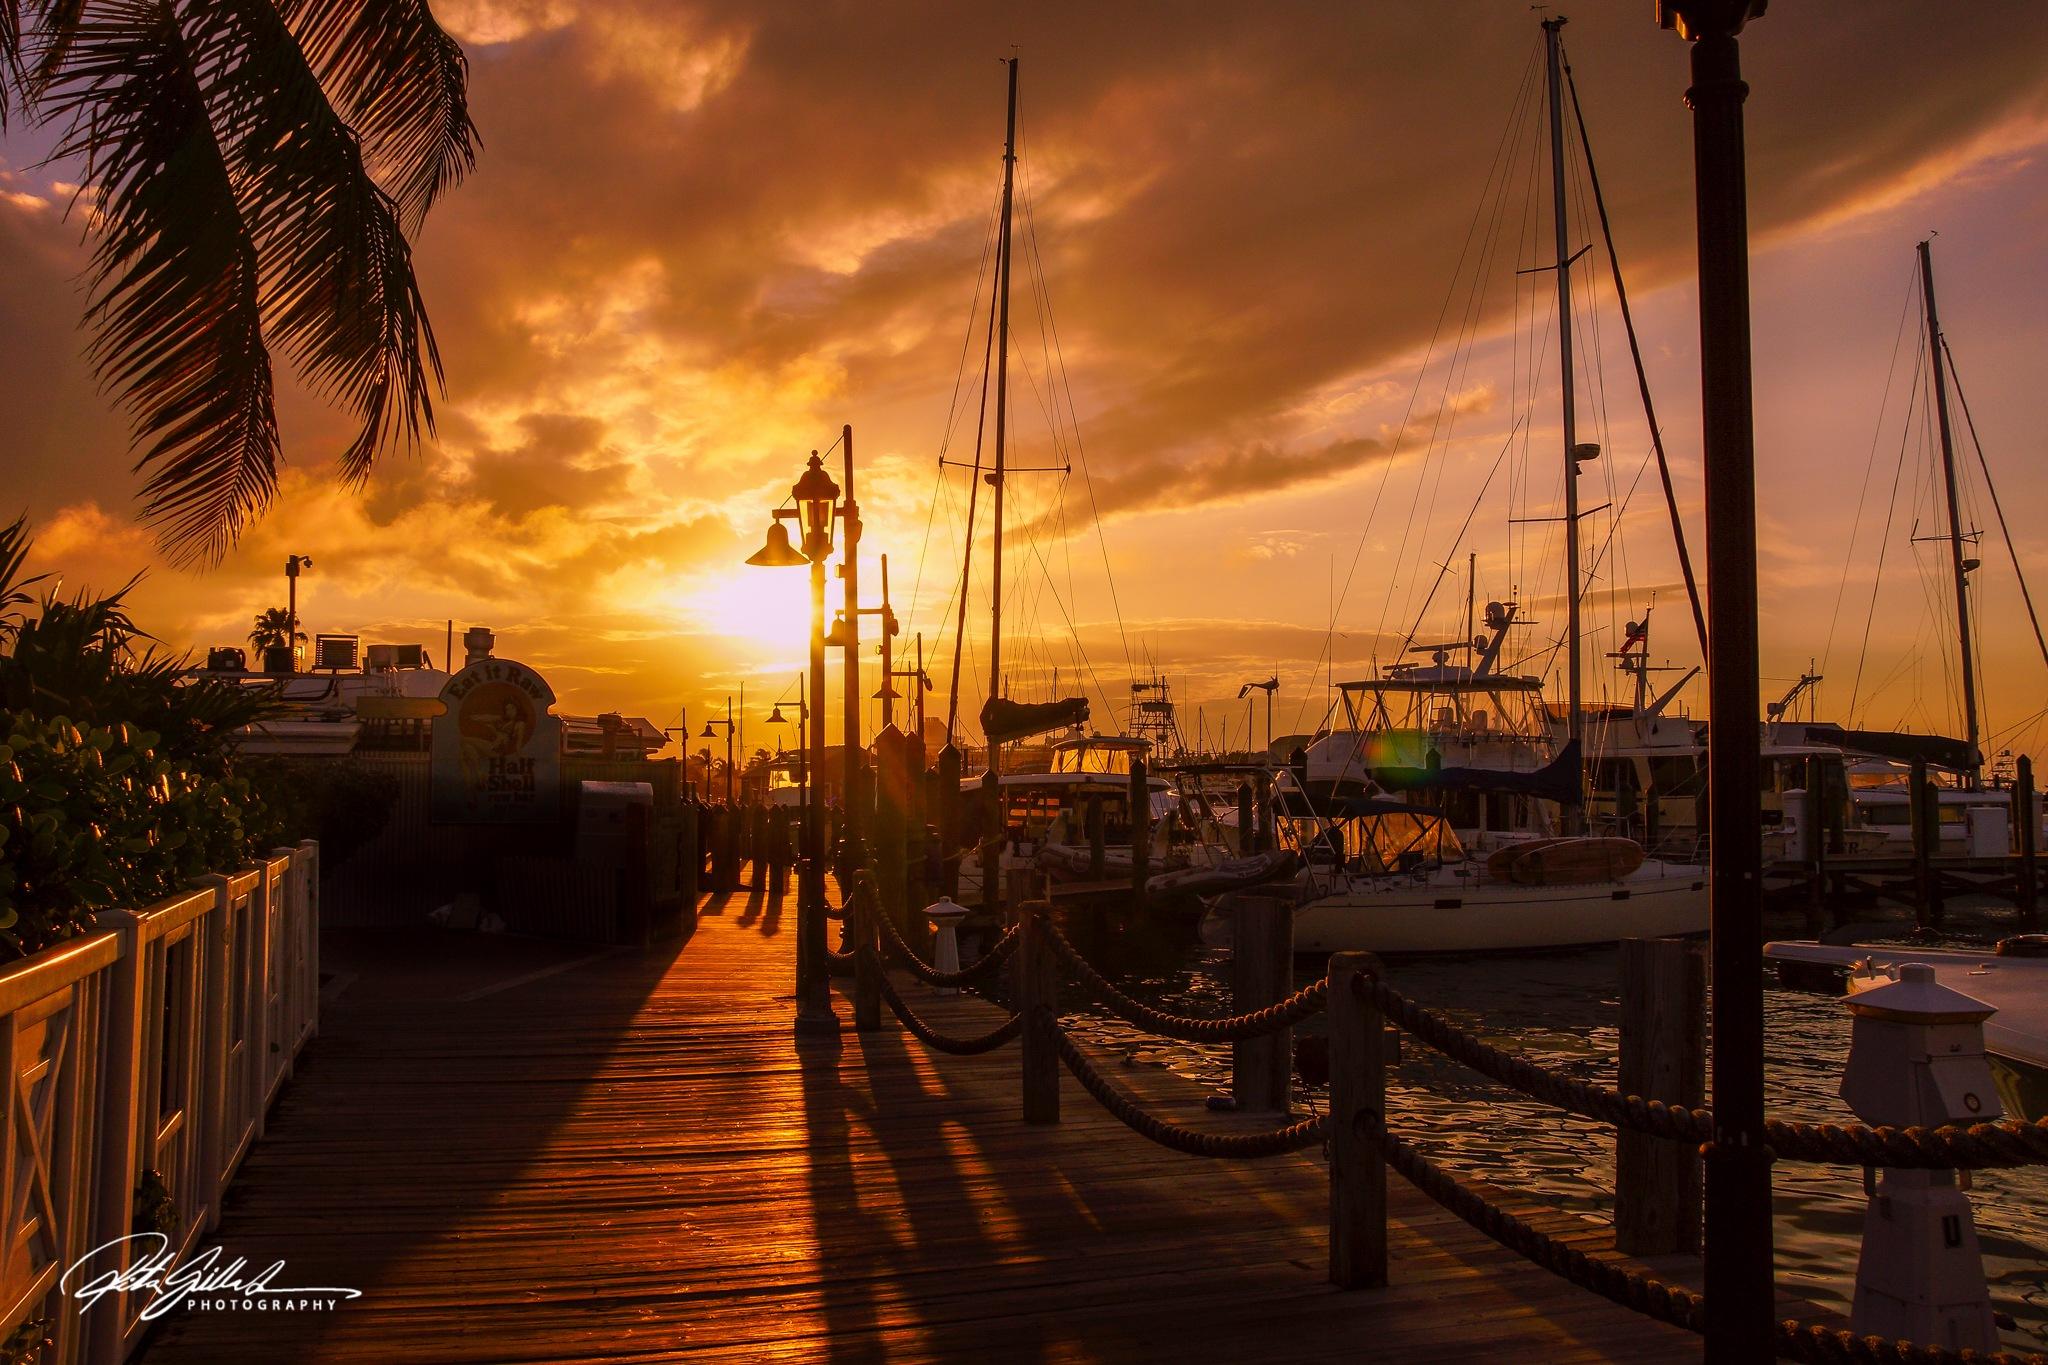 Sunset on Board walk by Ritva Sillanmäki  Photography